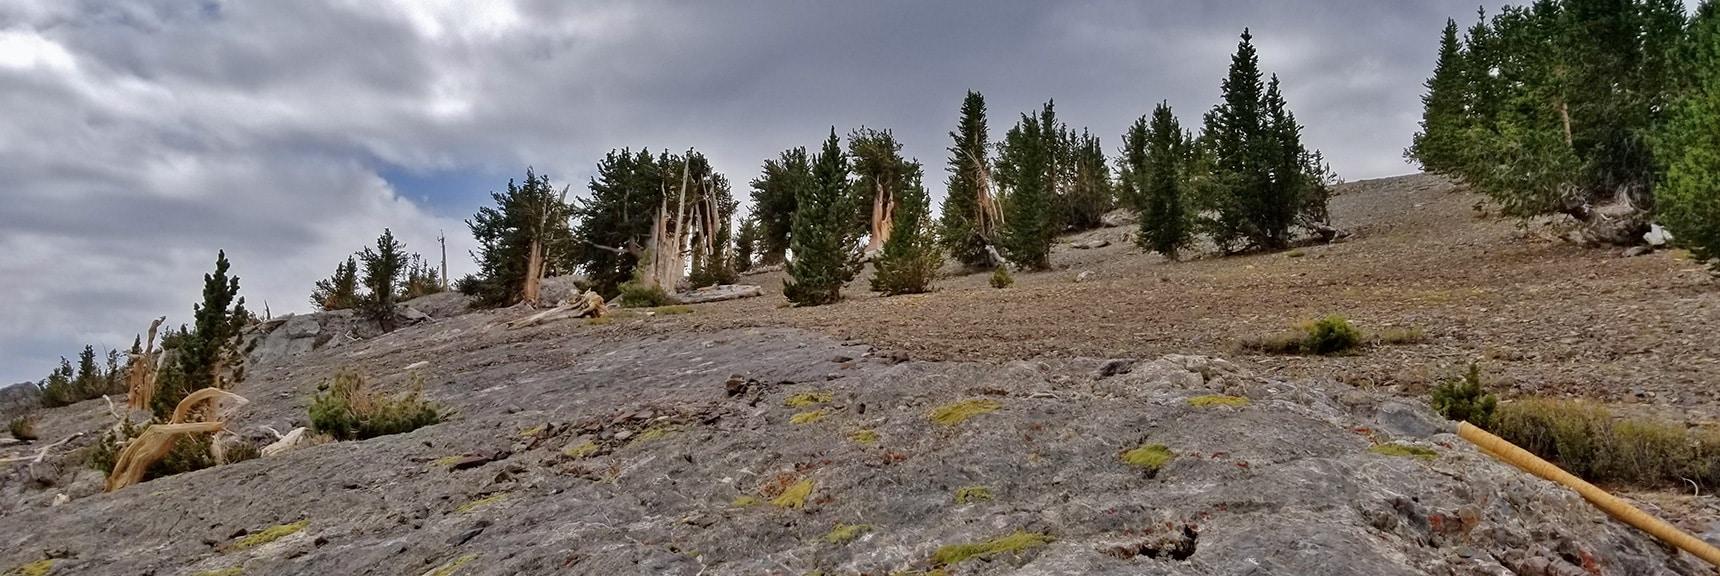 Looking Back South Toward Mummy Mountain Summit   Mummy Mountain Northern Rim Overlook, Spring Mountain Wilderness, Nevada